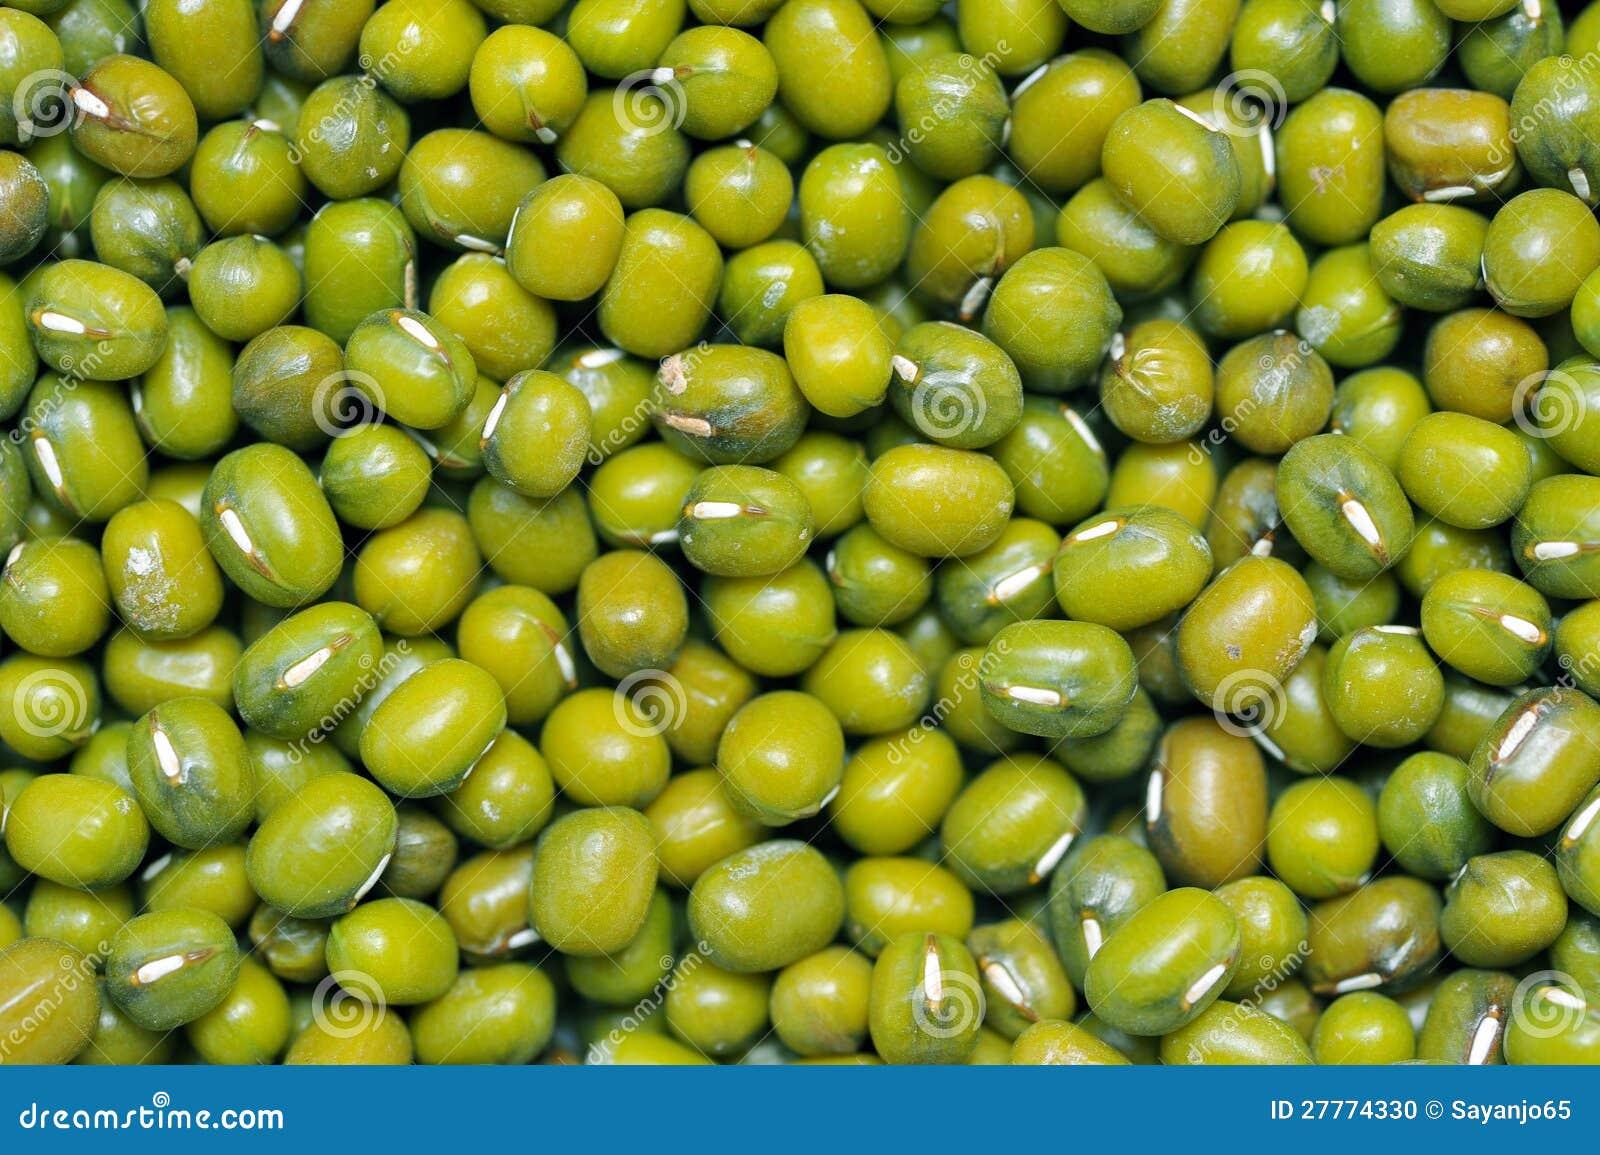 Fond d haricot vert ou de fèves de mung.